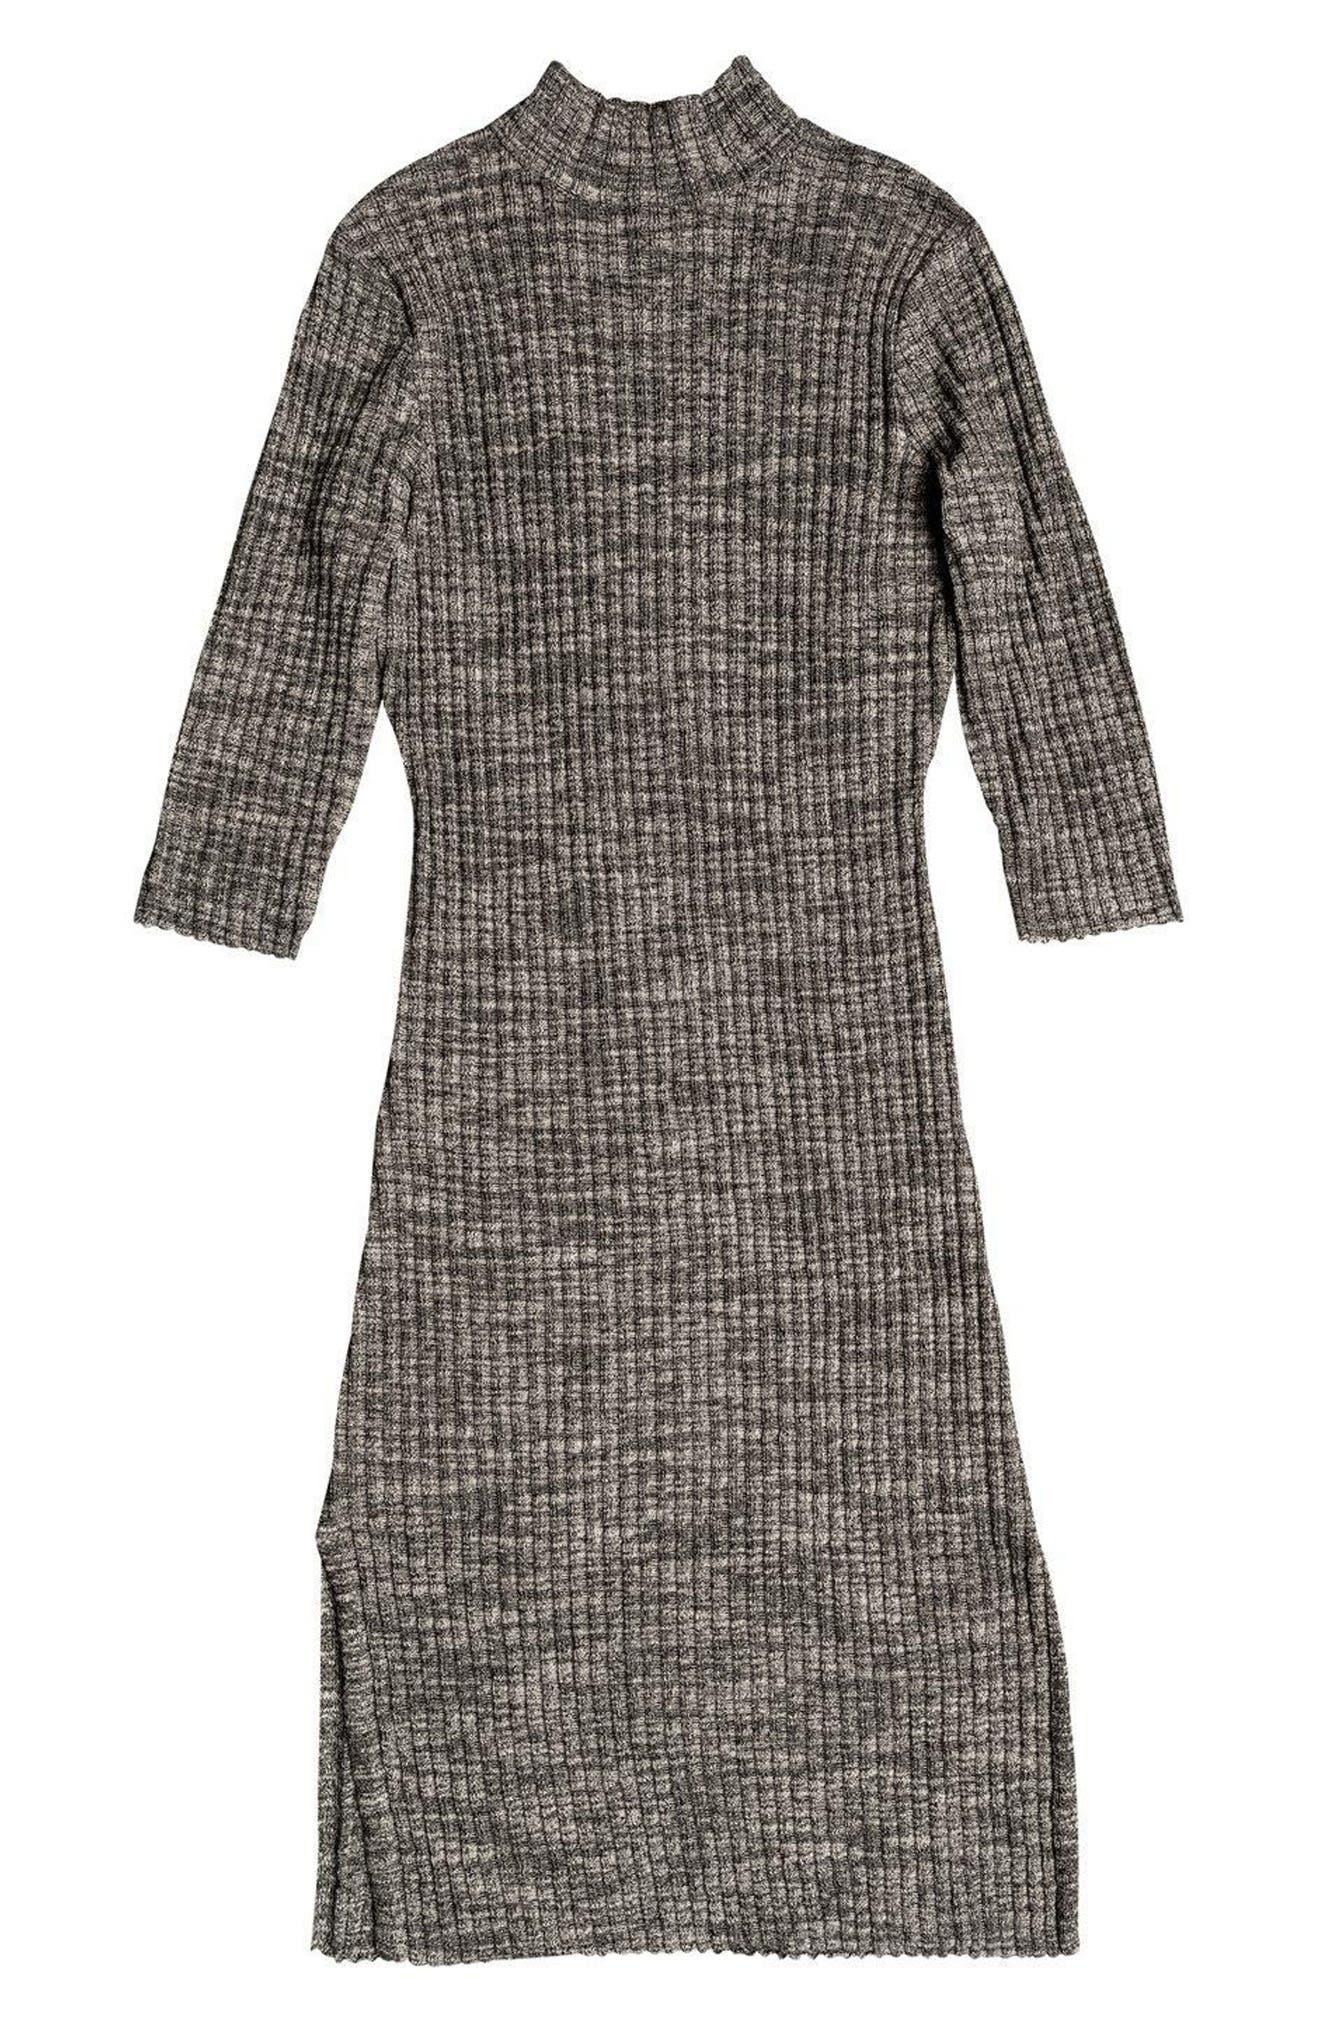 Hello Fall Sweater Dress,                             Alternate thumbnail 5, color,